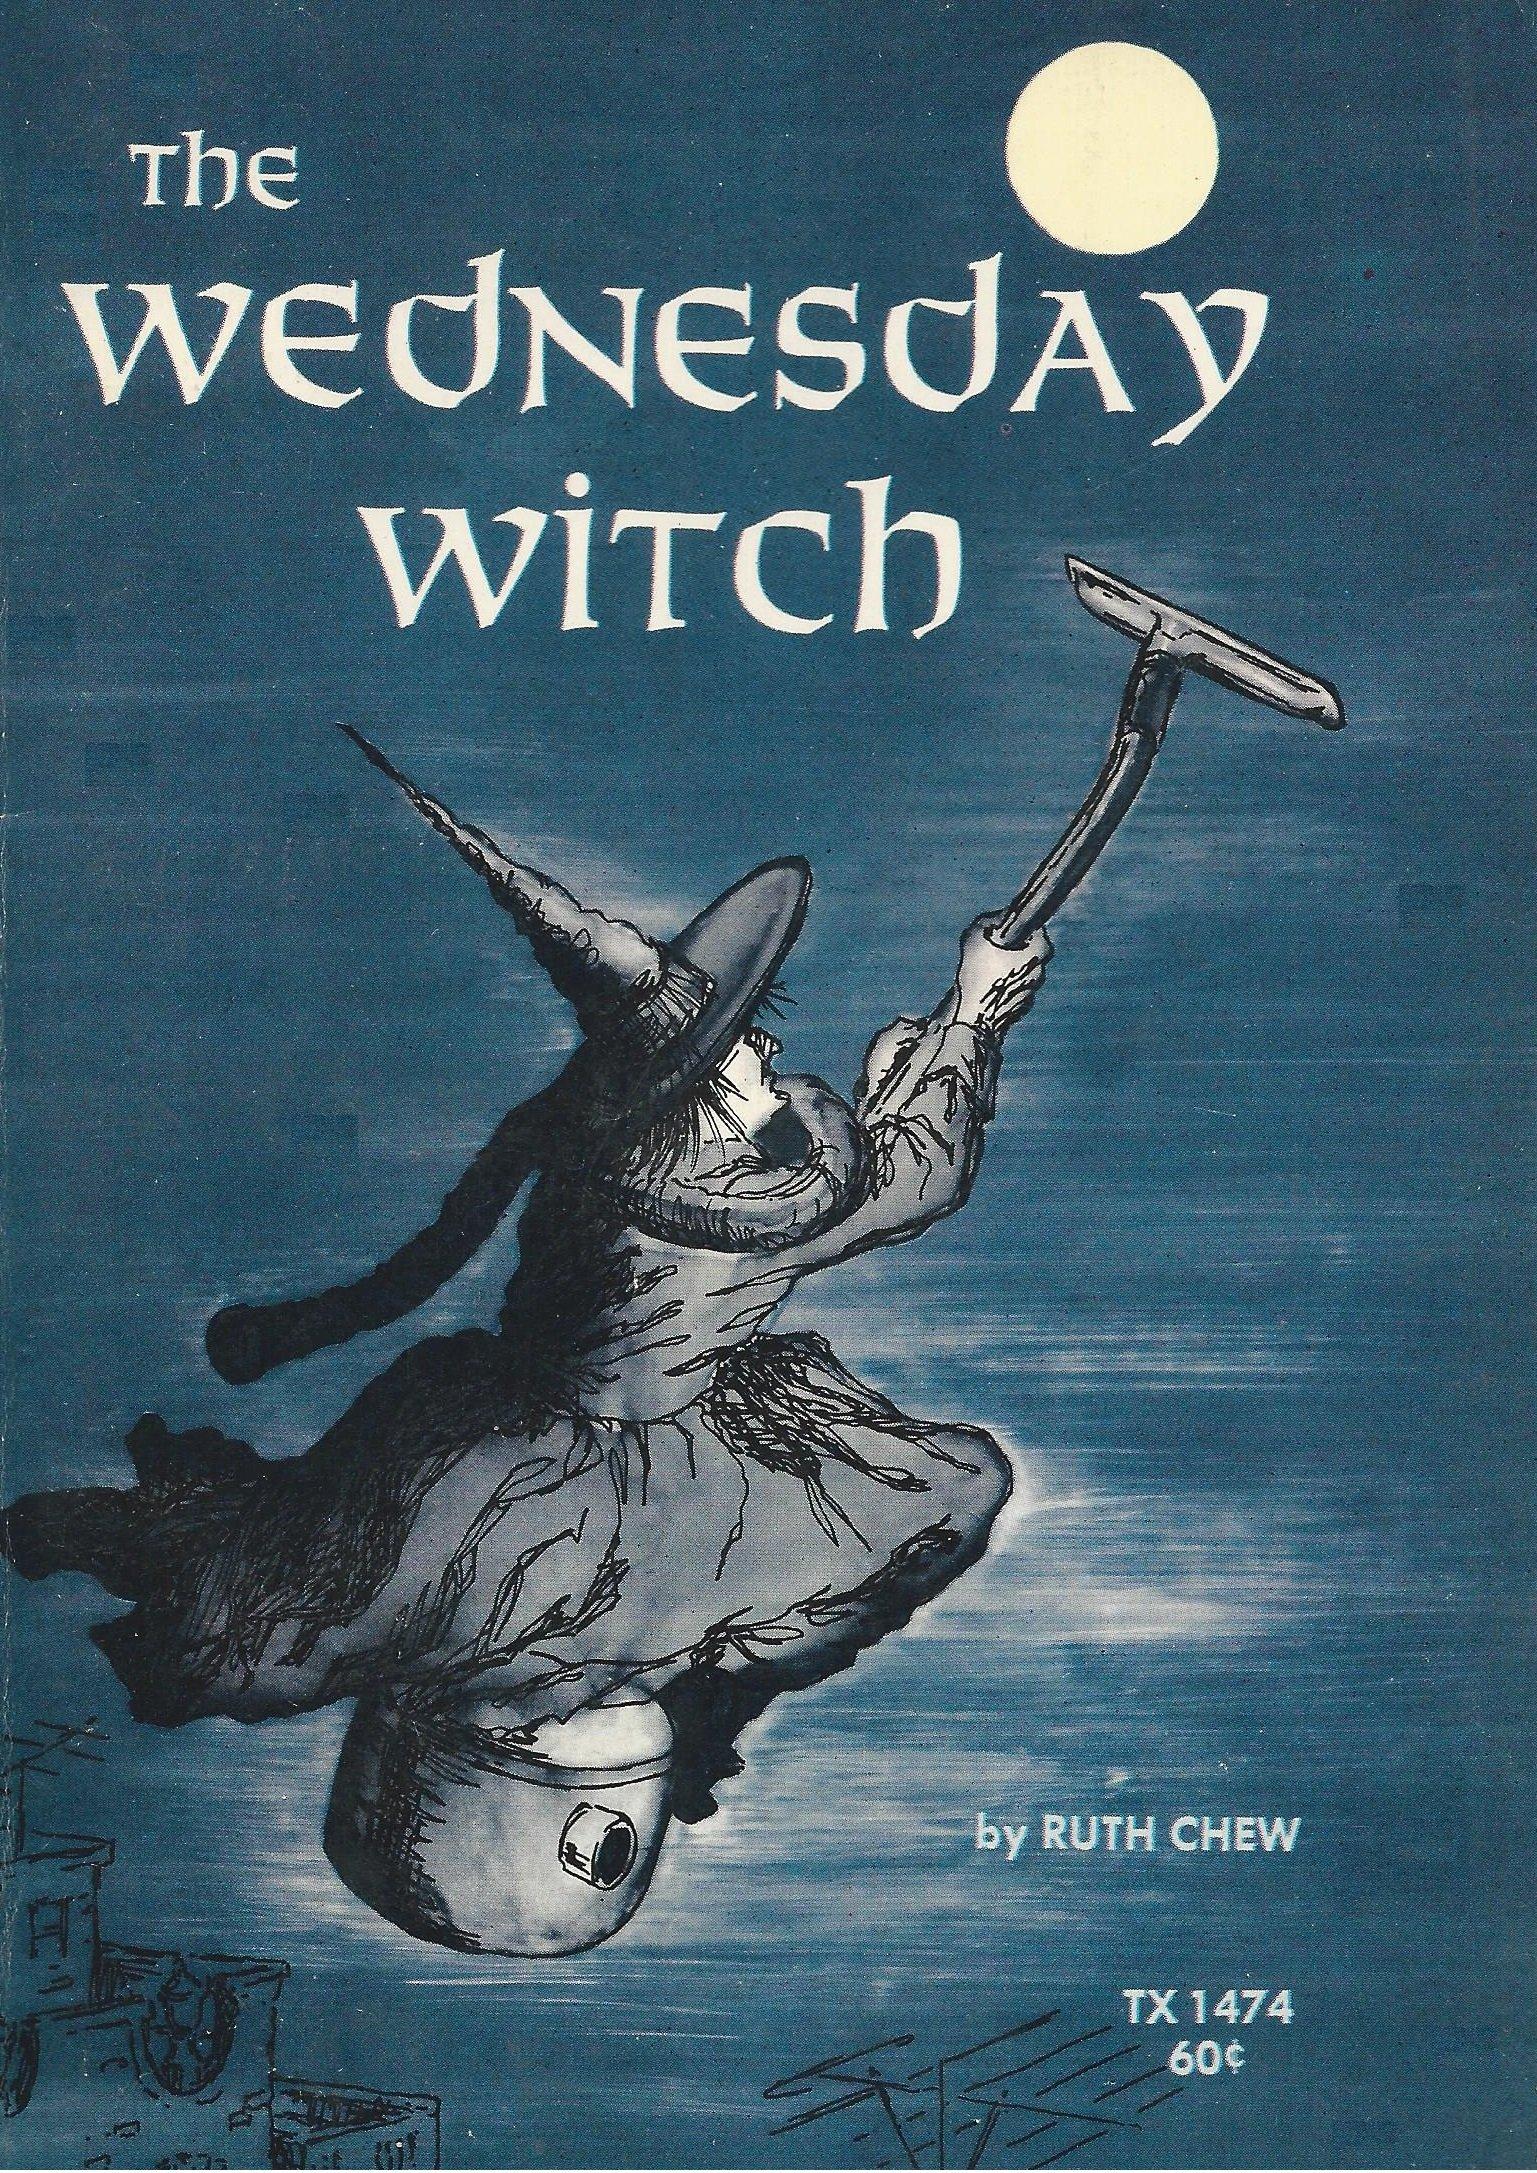 The Wednesday Witch: Ruth Chew: 9780590427616: Amazon.com: Books